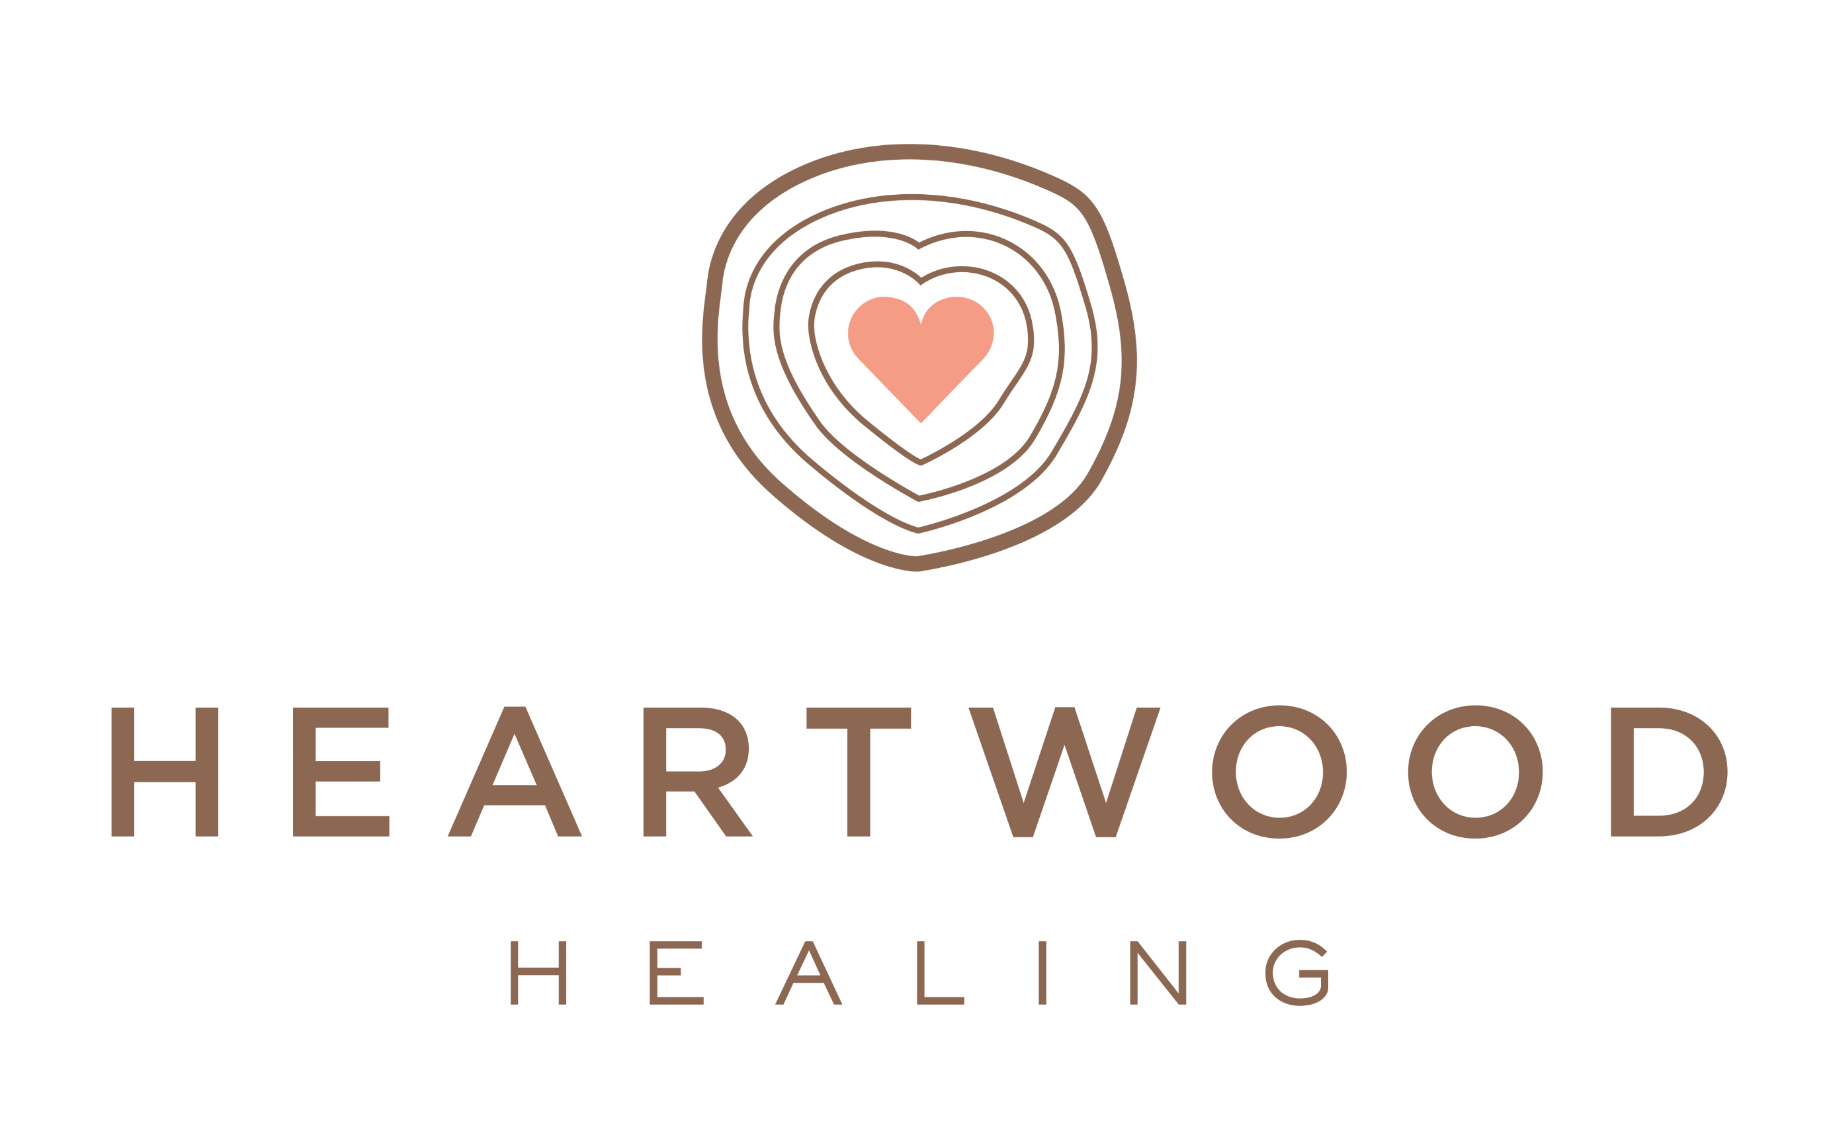 Heartwood Healing